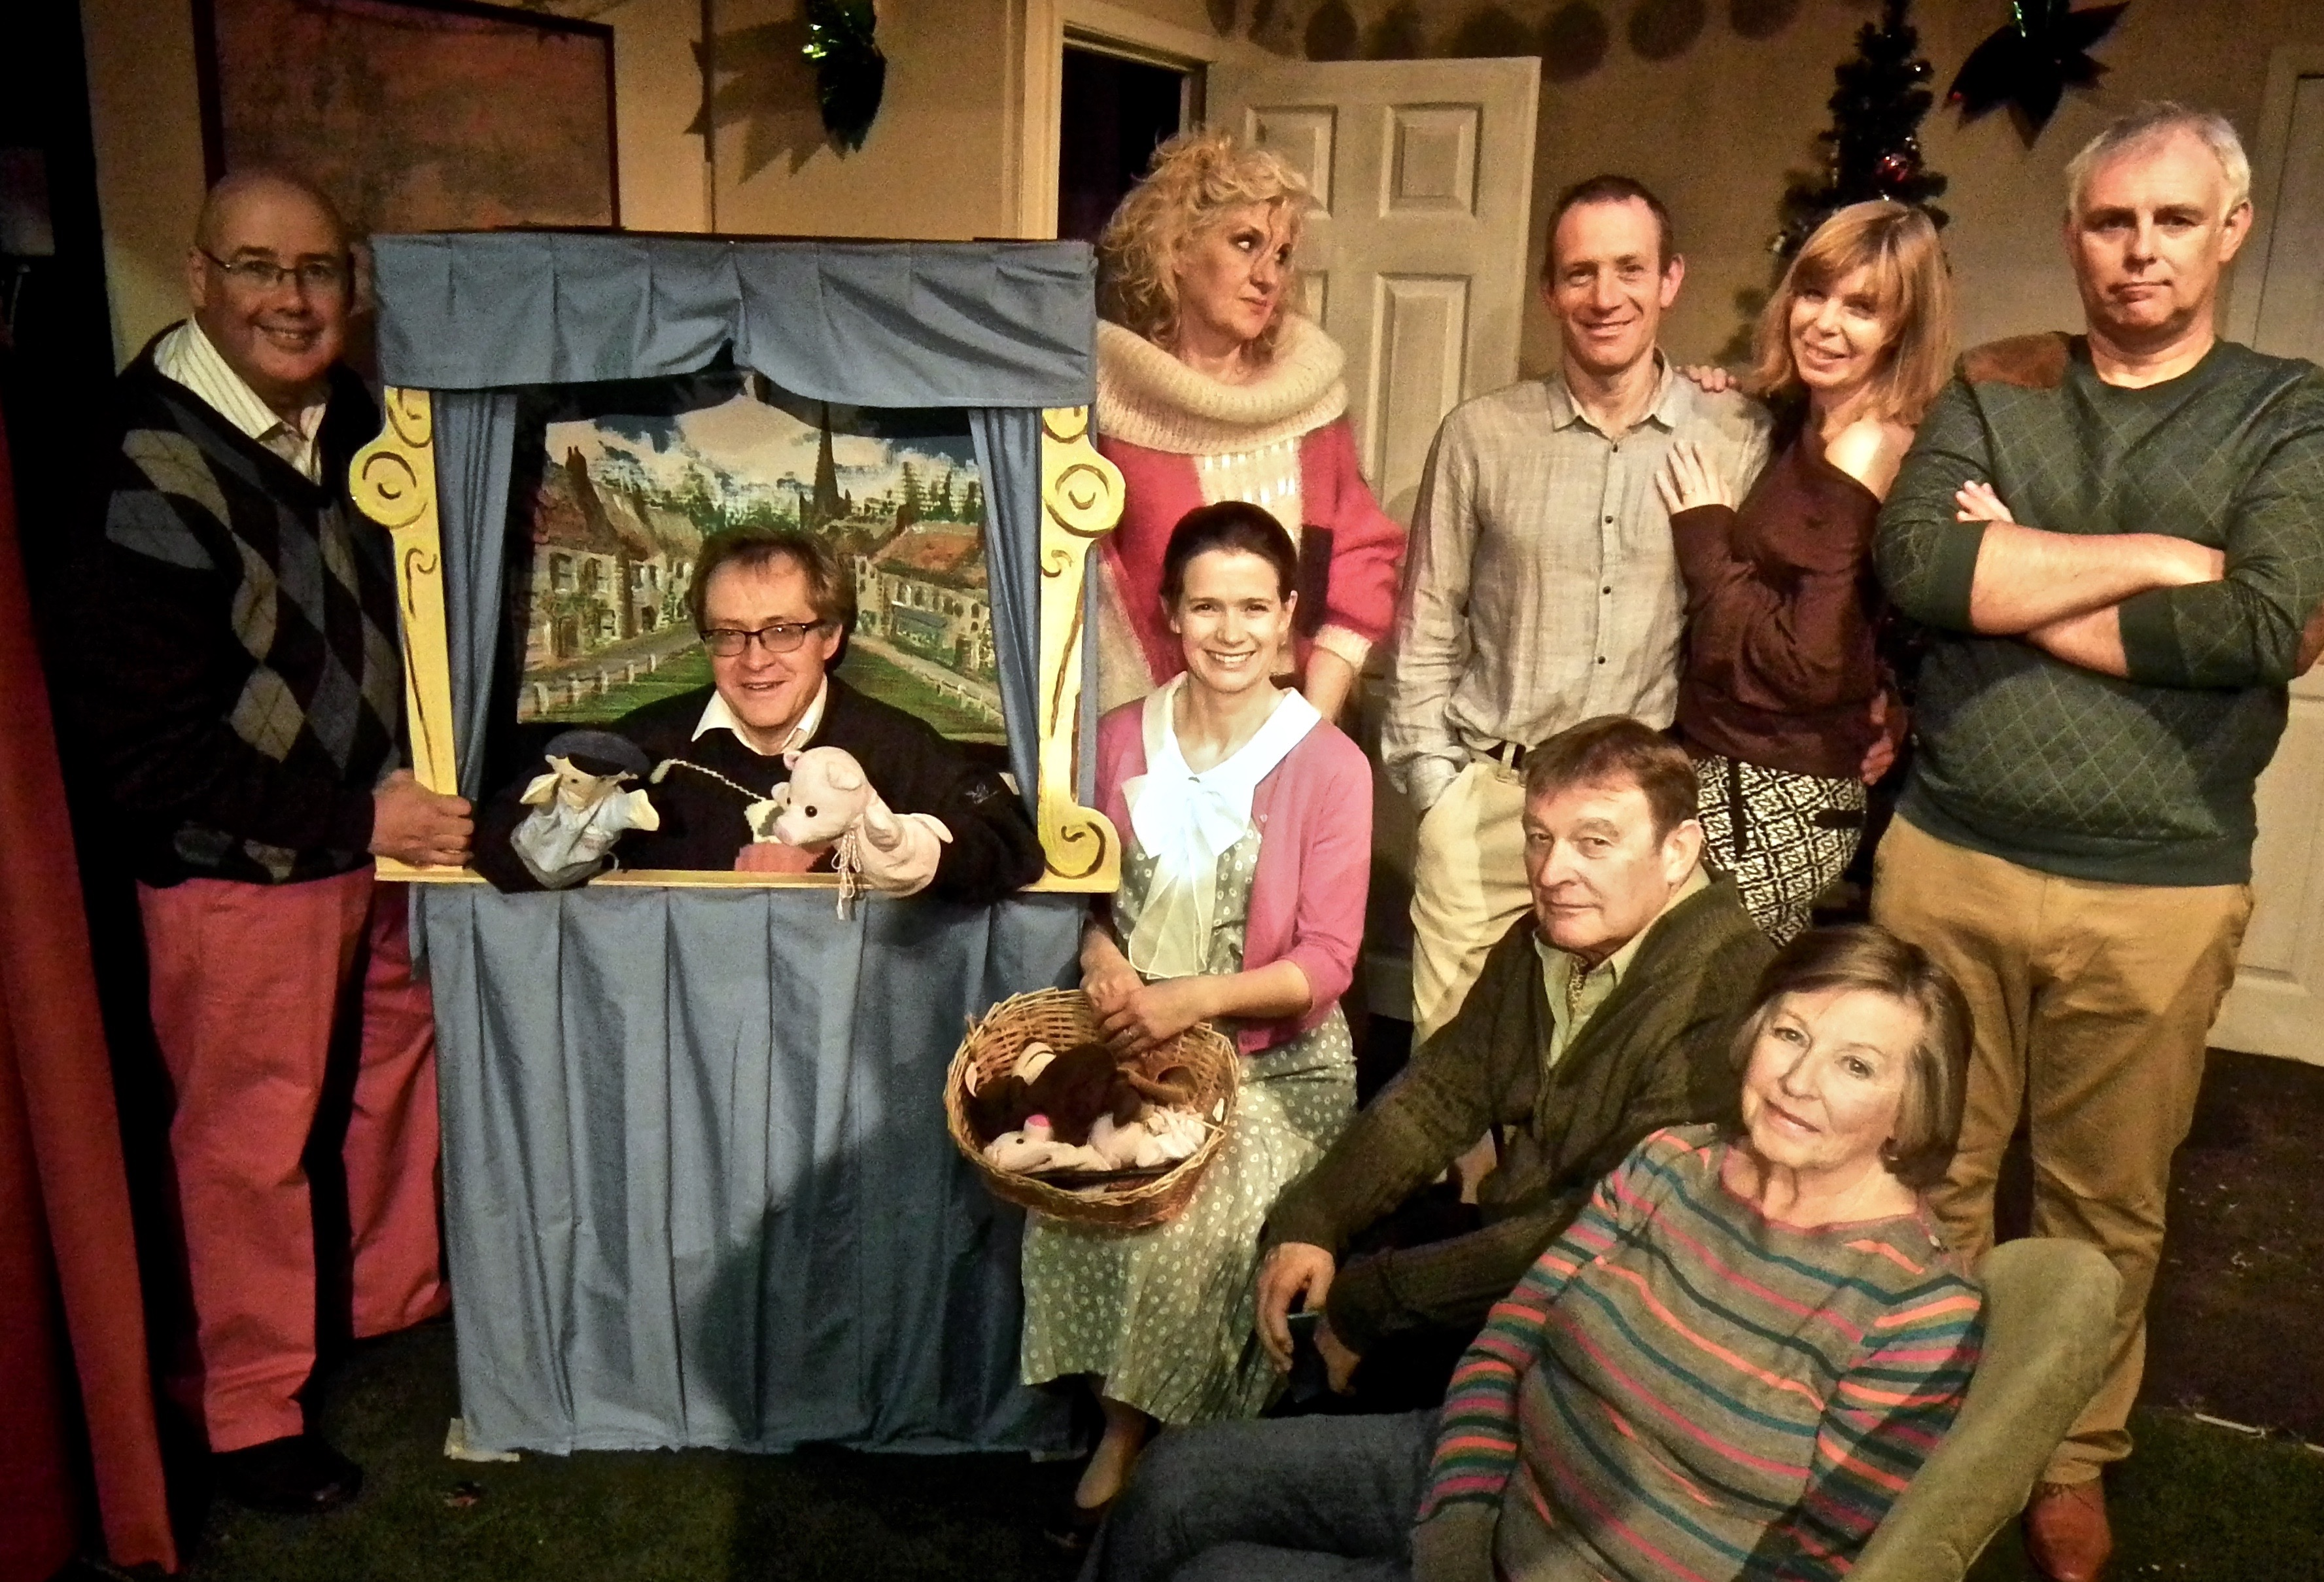 Seasons greetings bishopston amateur theatrical society bats unknown m4hsunfo